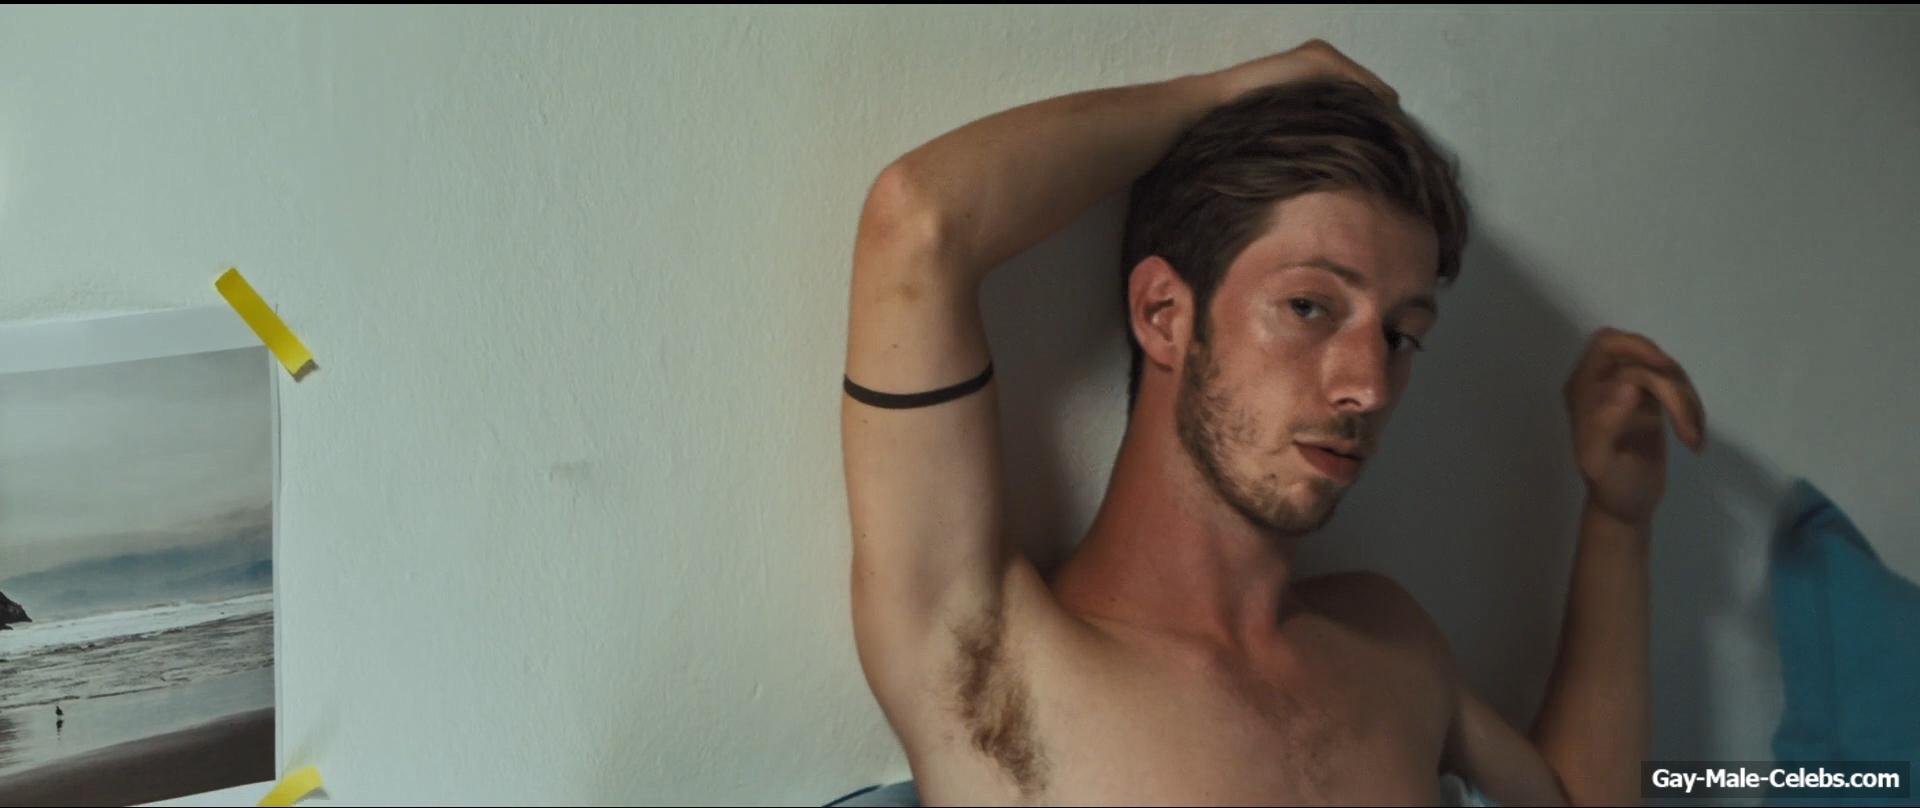 Male nude actors arrons